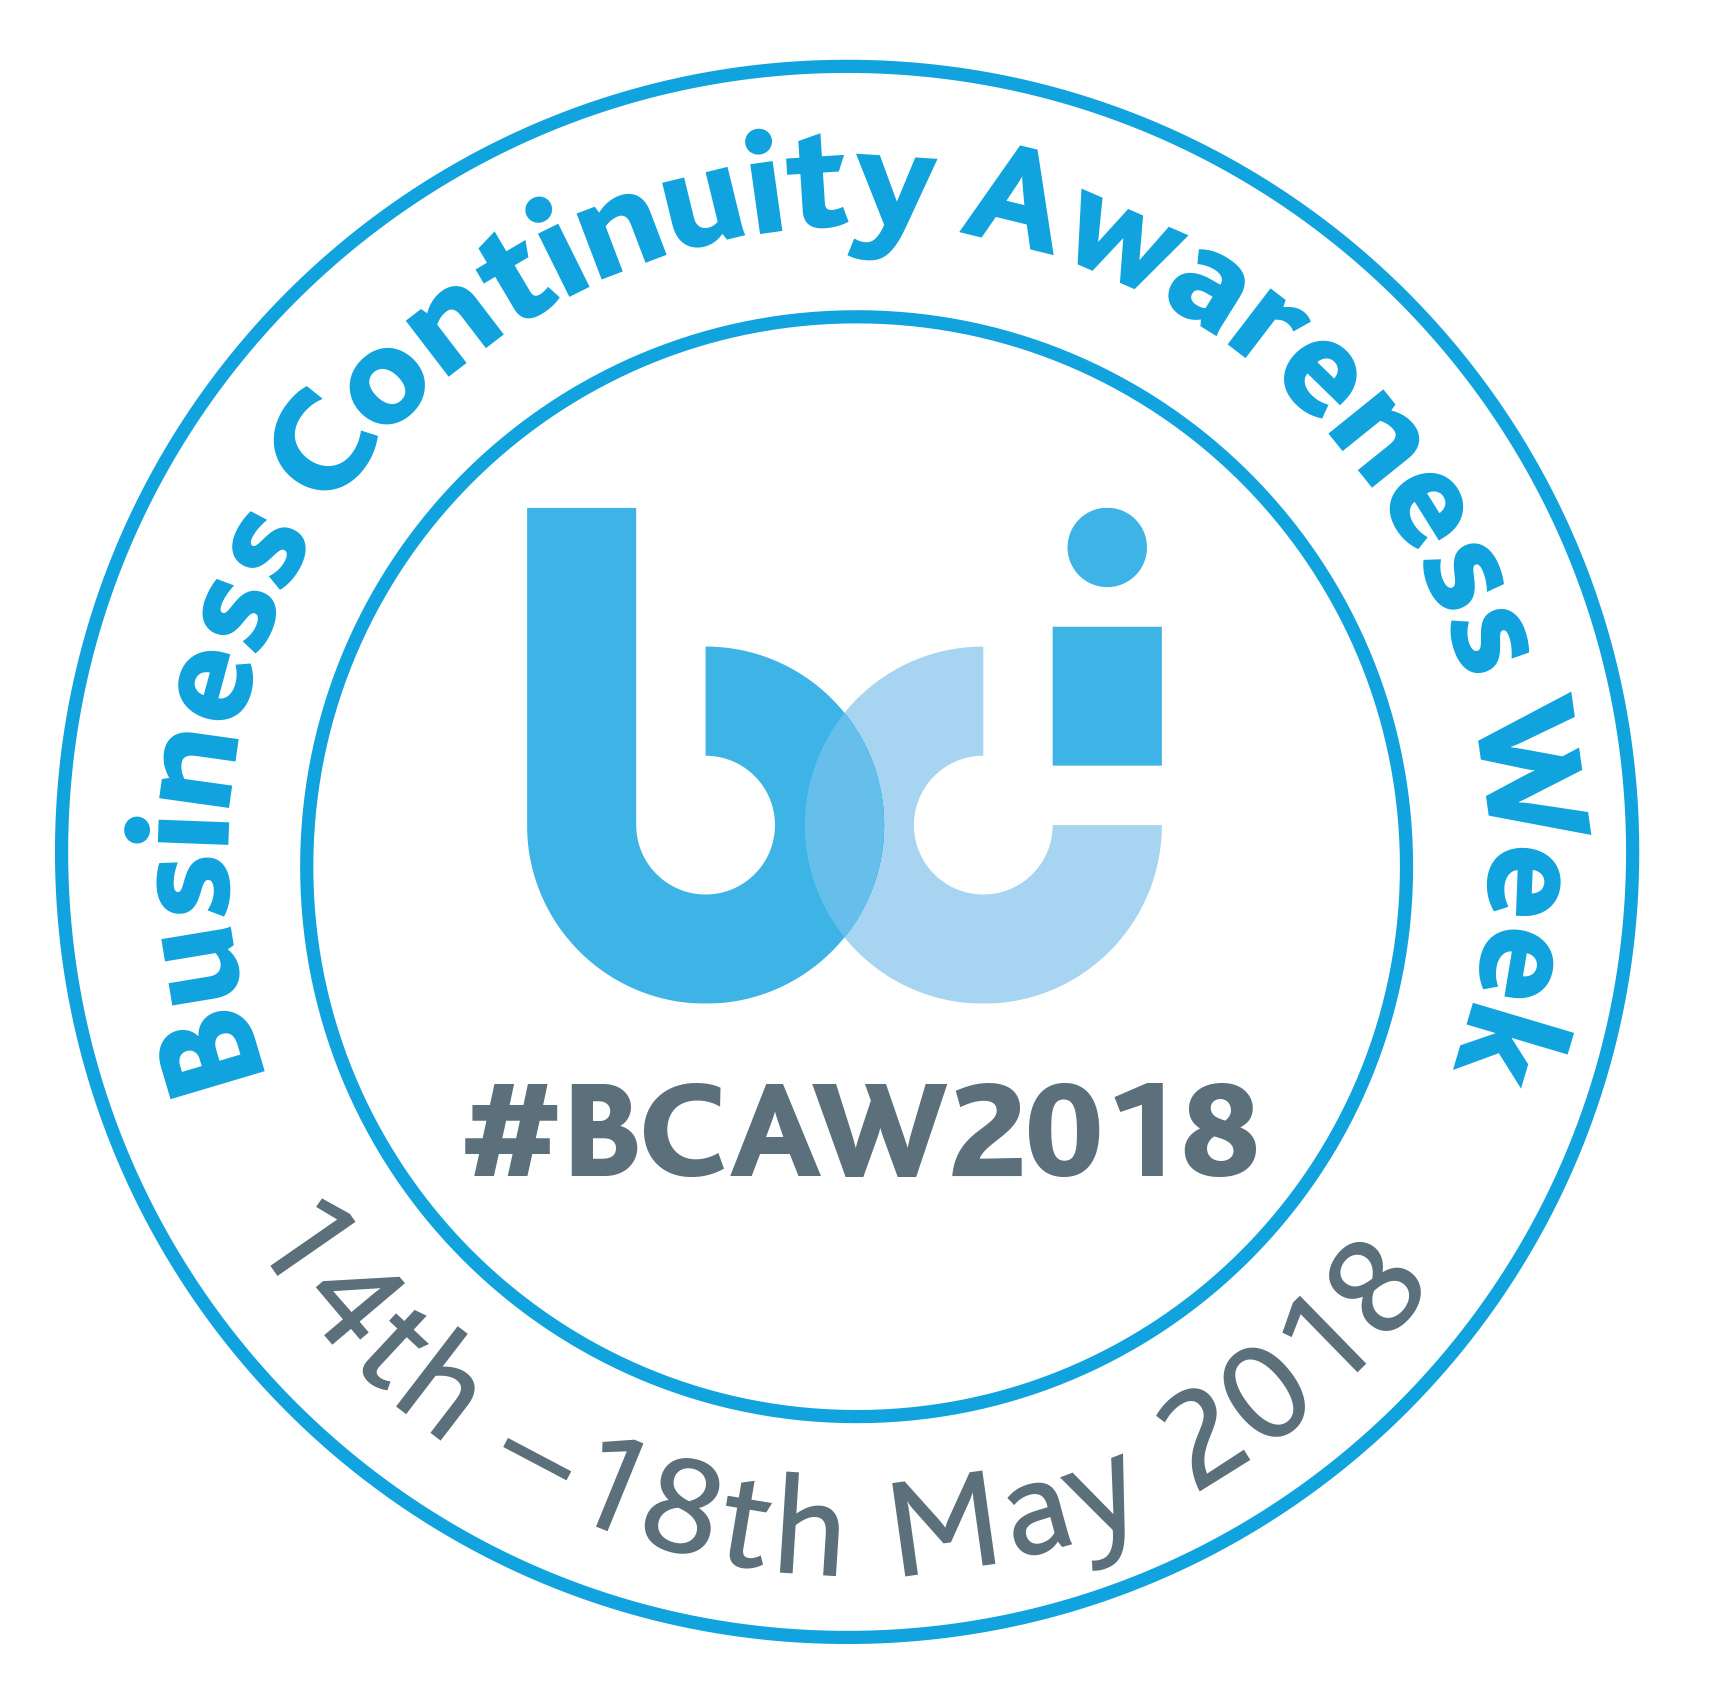 Business Continuity Awareness Week 2018